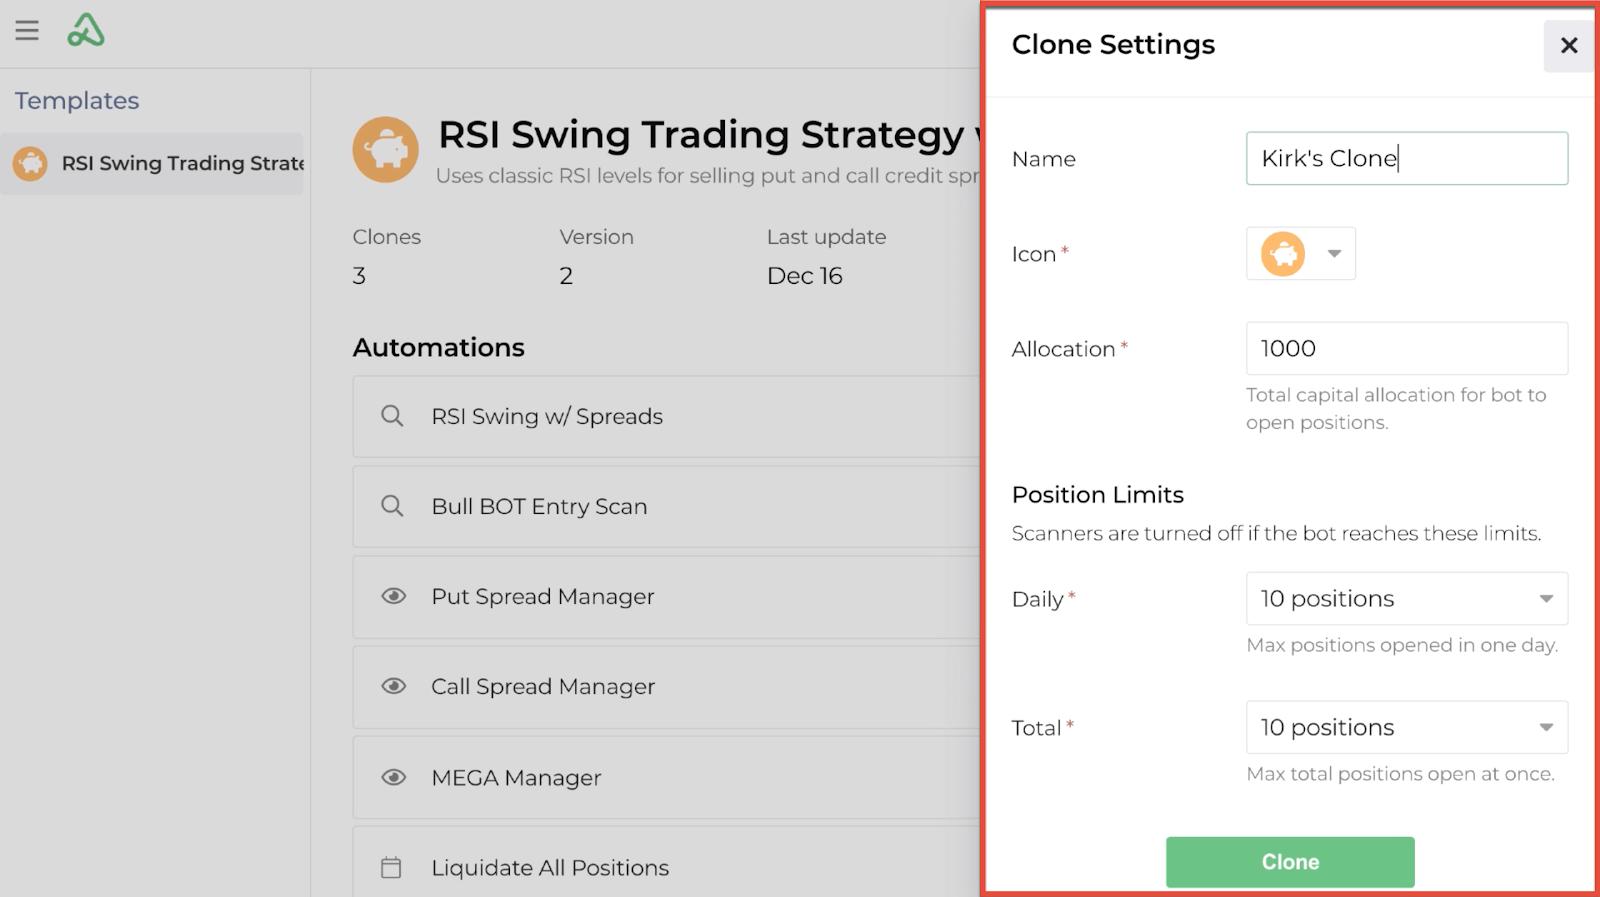 Screenshot highlighting the global settings for a new bot clone